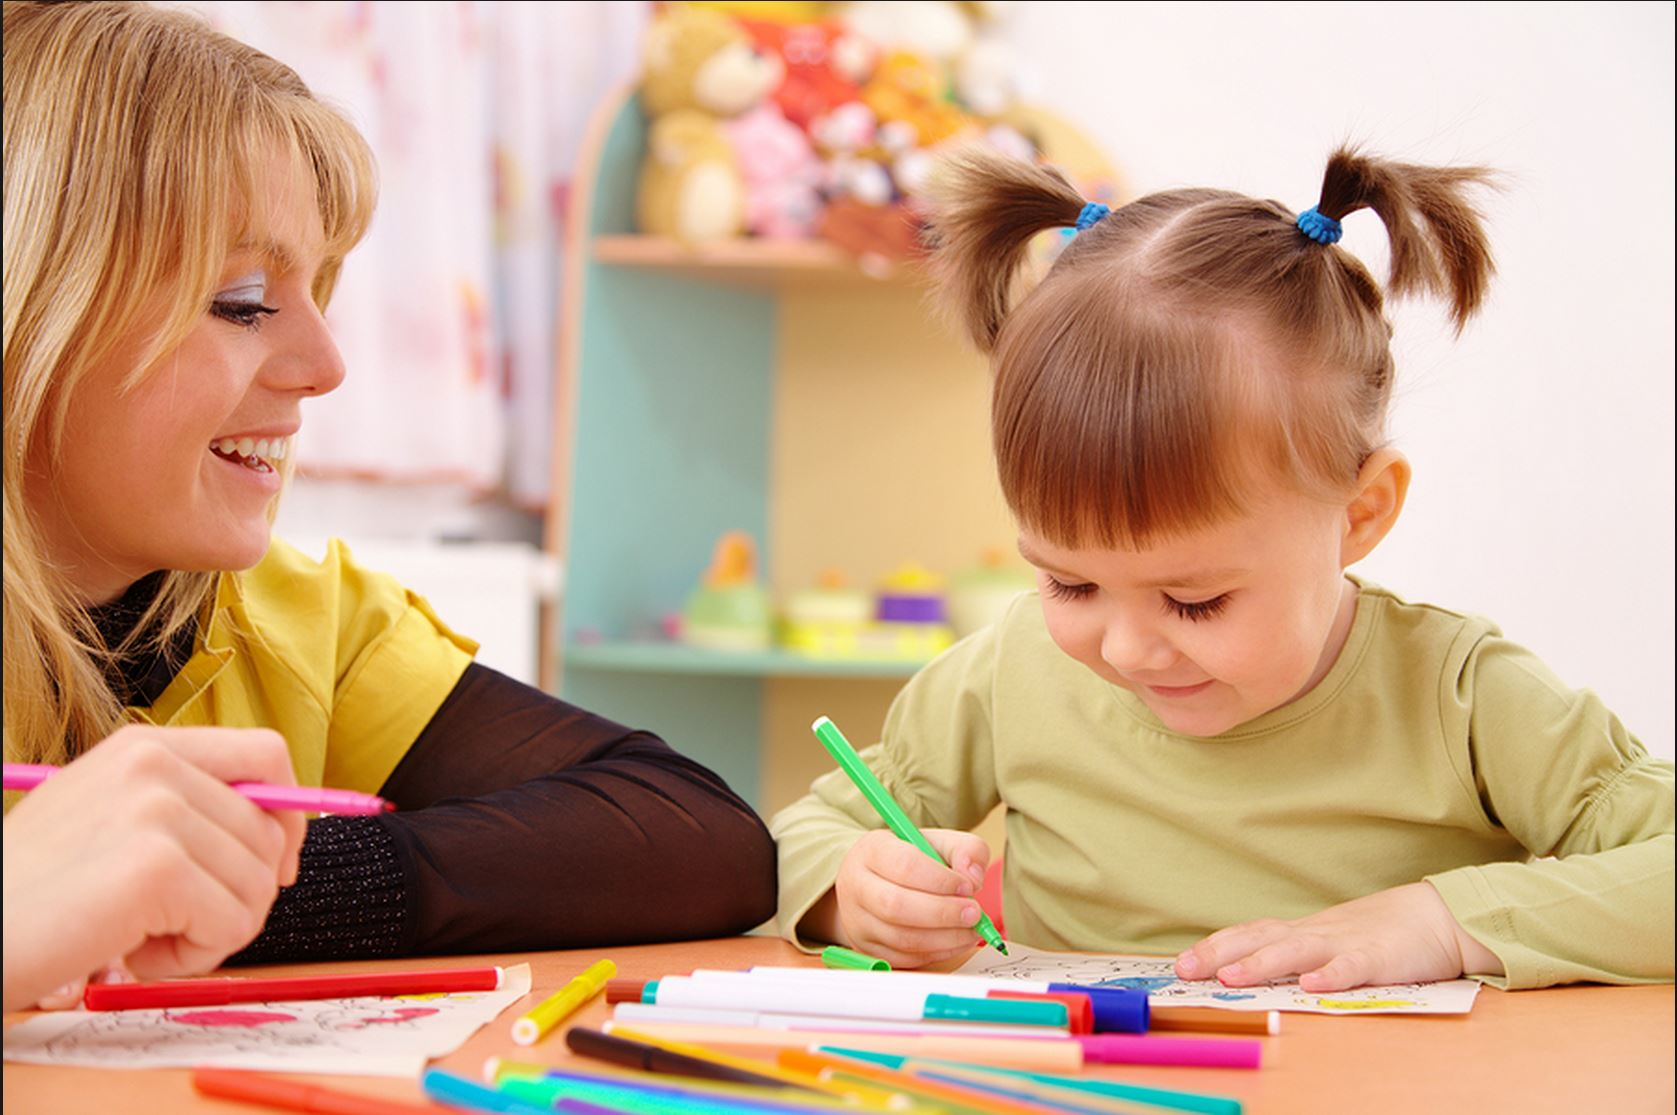 Работа: Присмотр за ребенком в Москве - 3194 вакансии Jooble